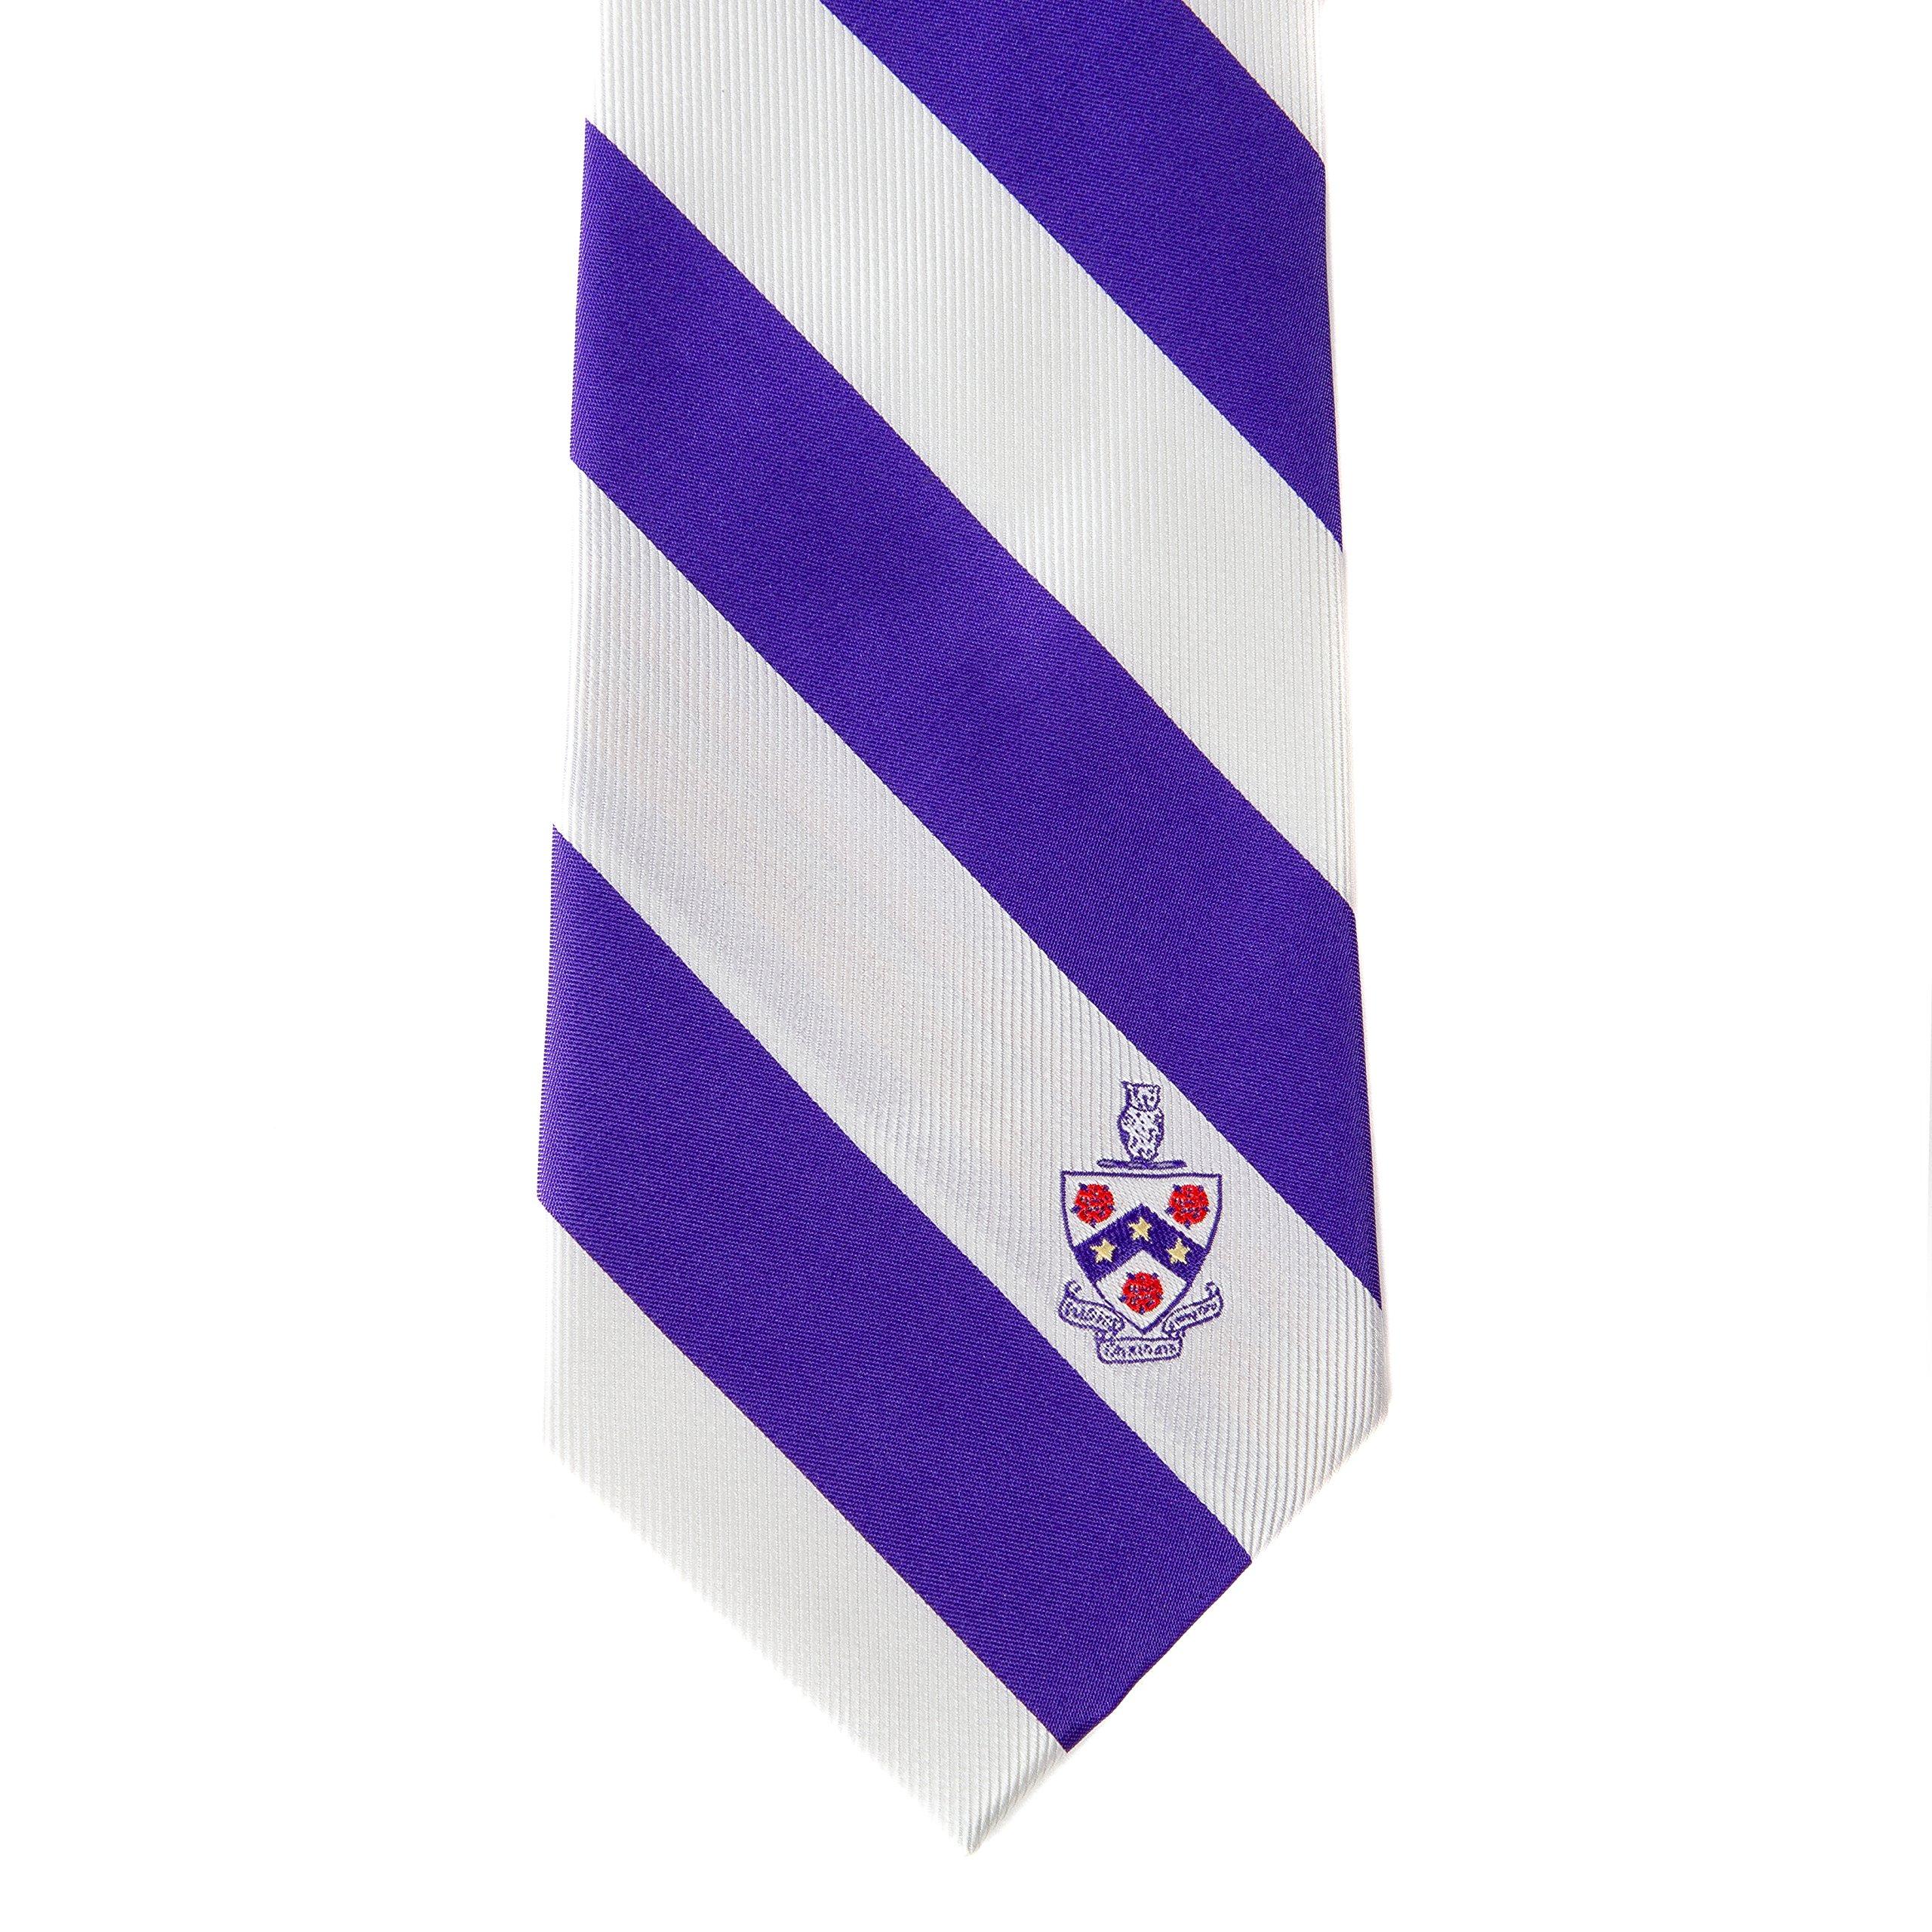 Phi Gamma Delta Fraternity Necktie Tie Greek Formal Occasion Standard Length Width Hanky Pocket Square Fiji (Striped Crest Necktie)